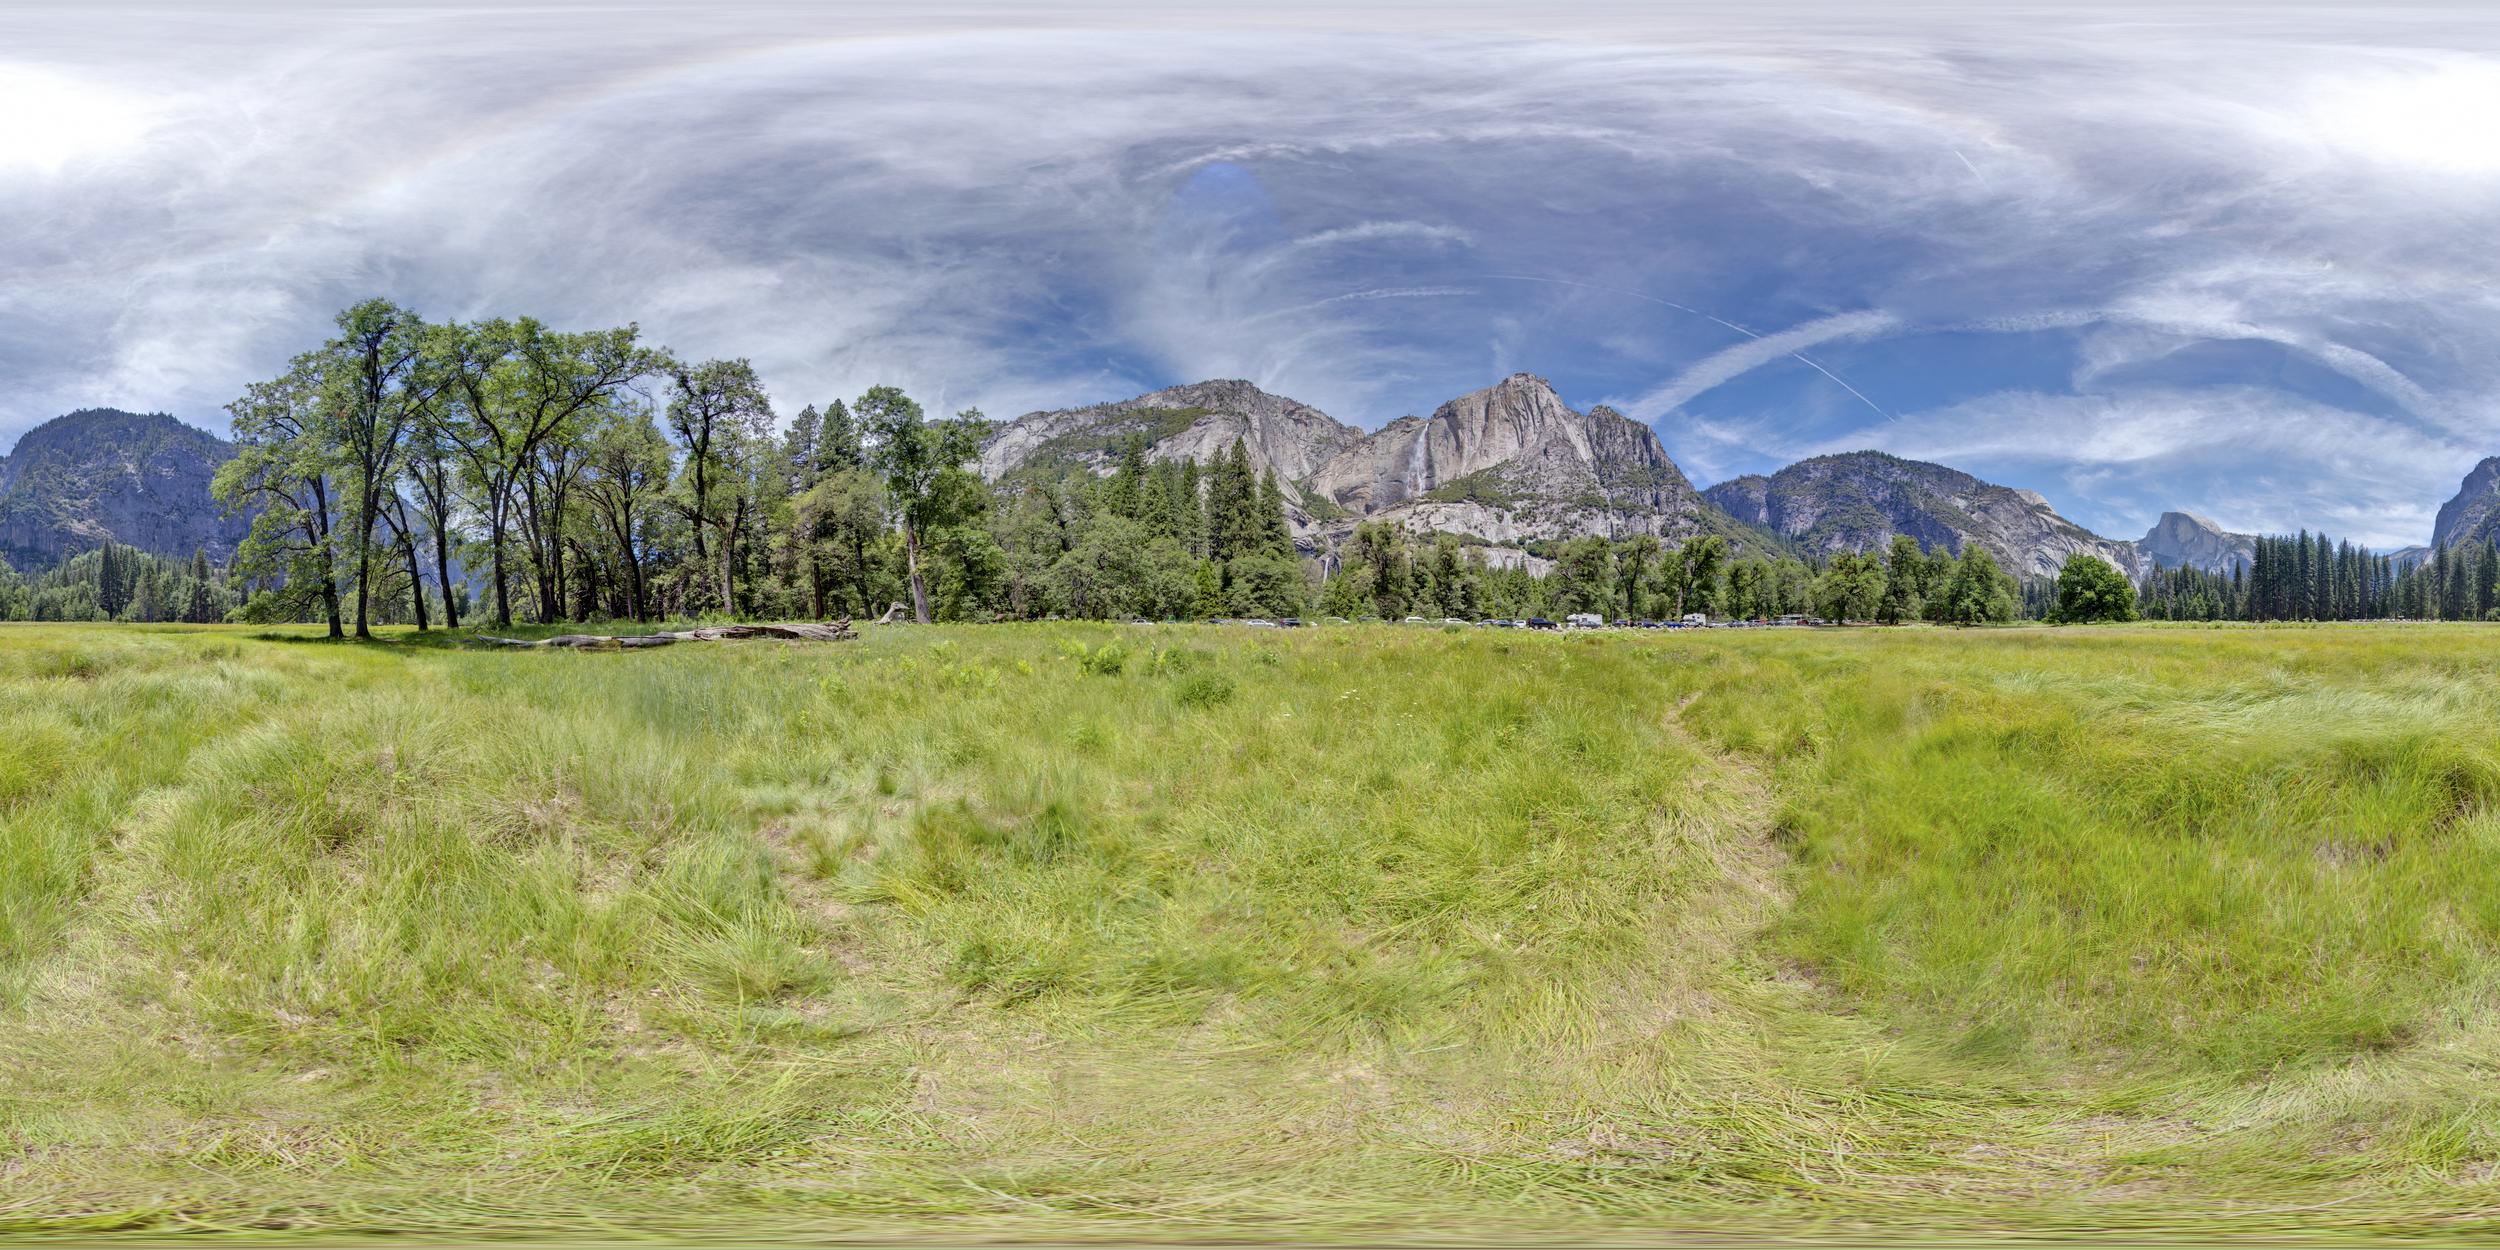 360º Landscape; View of Yosemite Falls Meadow at Yosemite National Park.